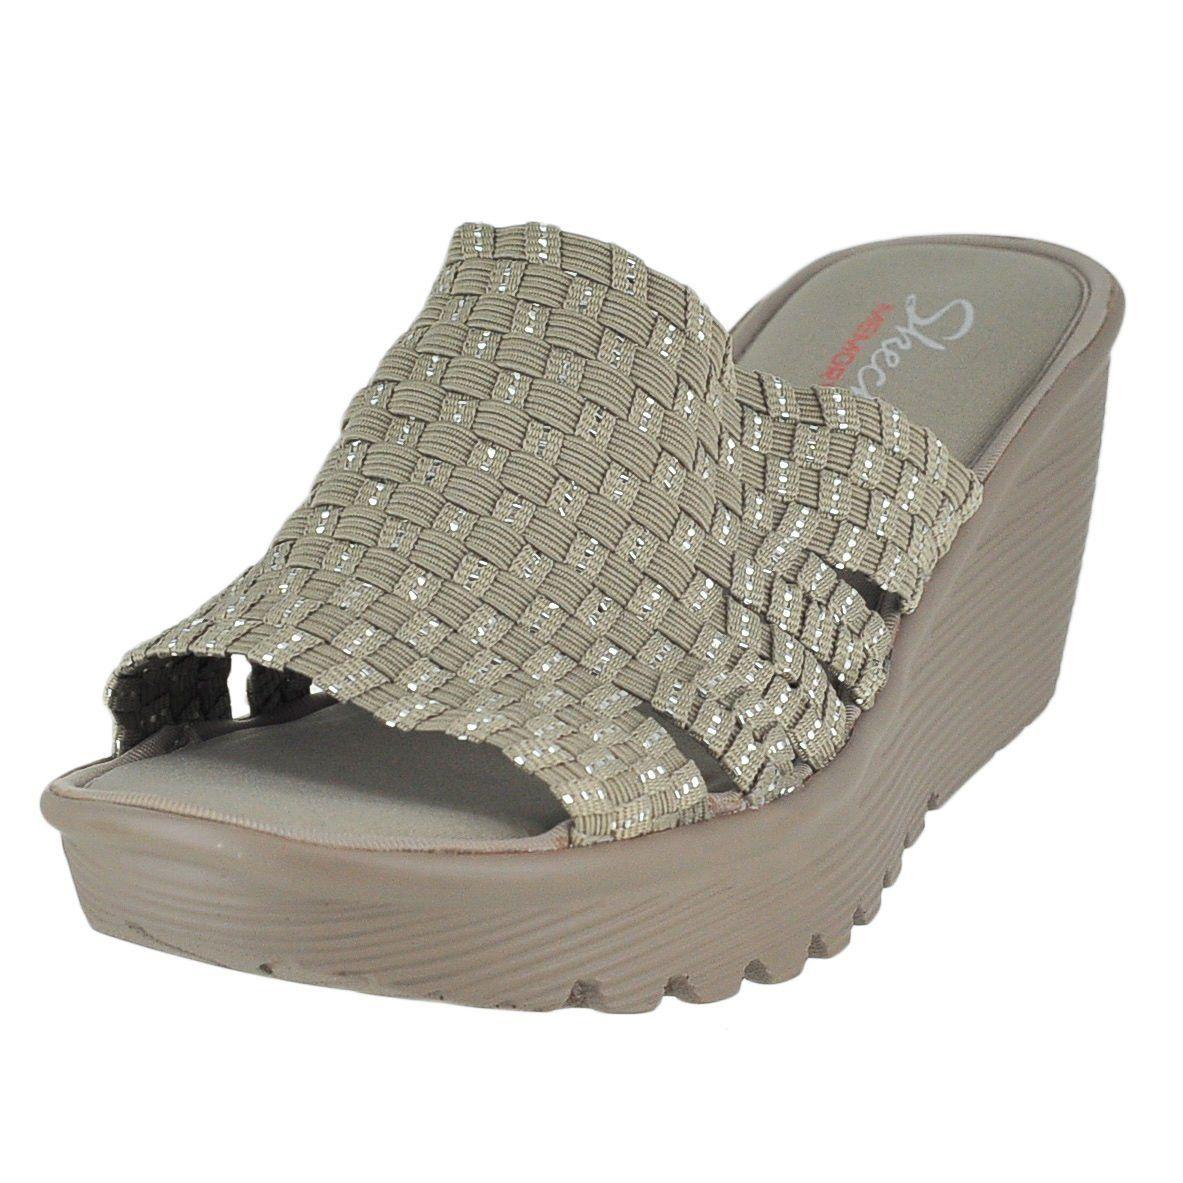 a831c49b8872 Skechers Cali Women s Parallel-Milk and Honey Wedge Sandal